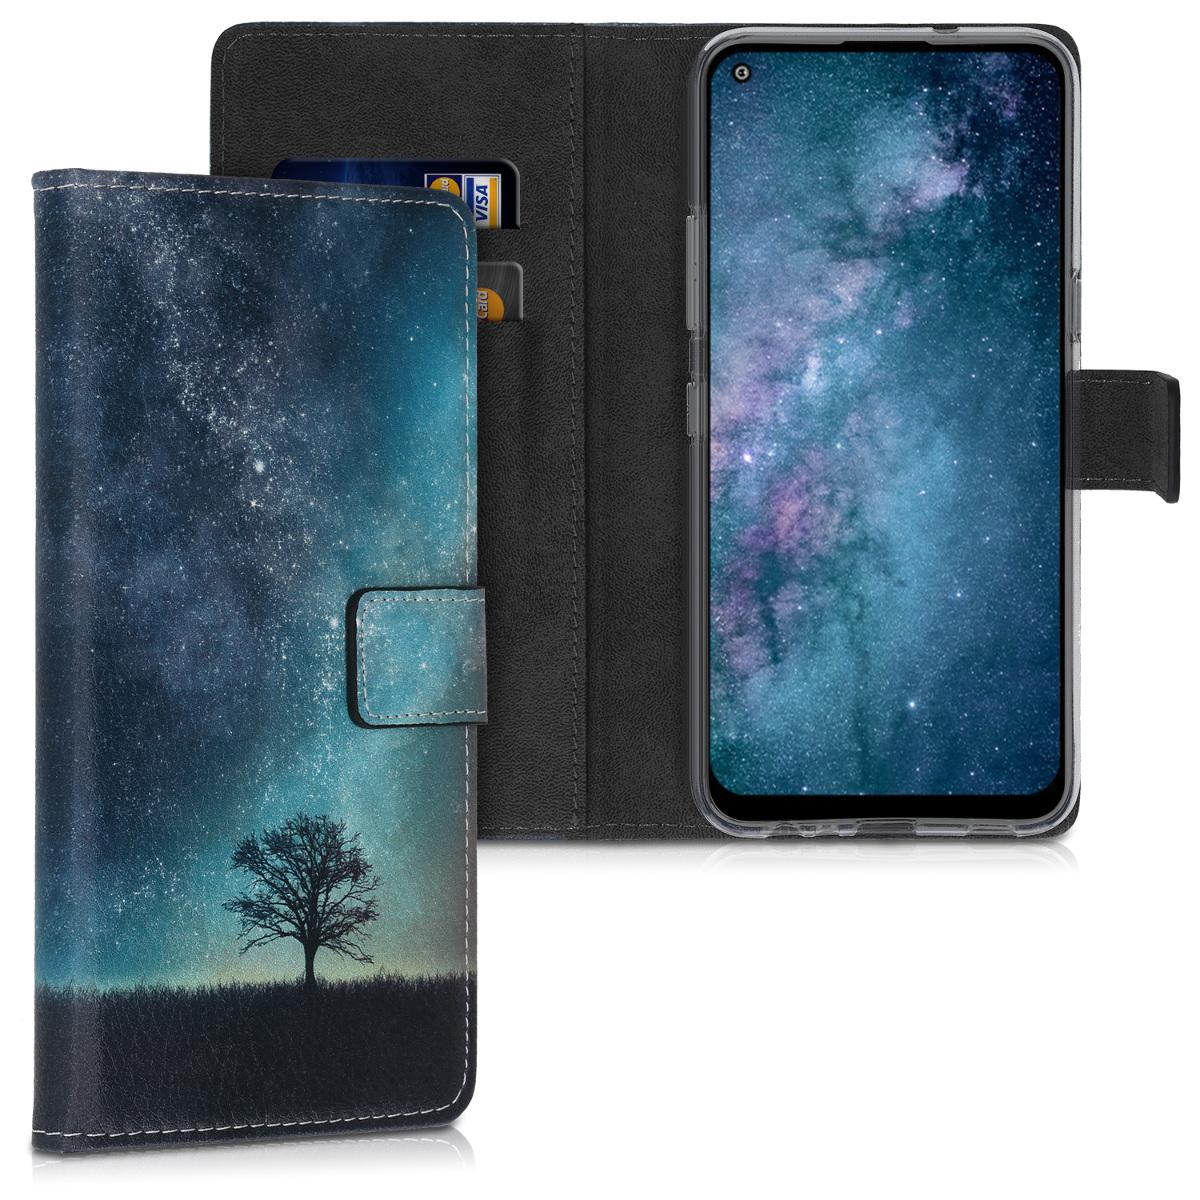 KW Θήκη Πορτοφόλι LG K61 - Cosmic Nature Blue / Grey / Black (52065.02)